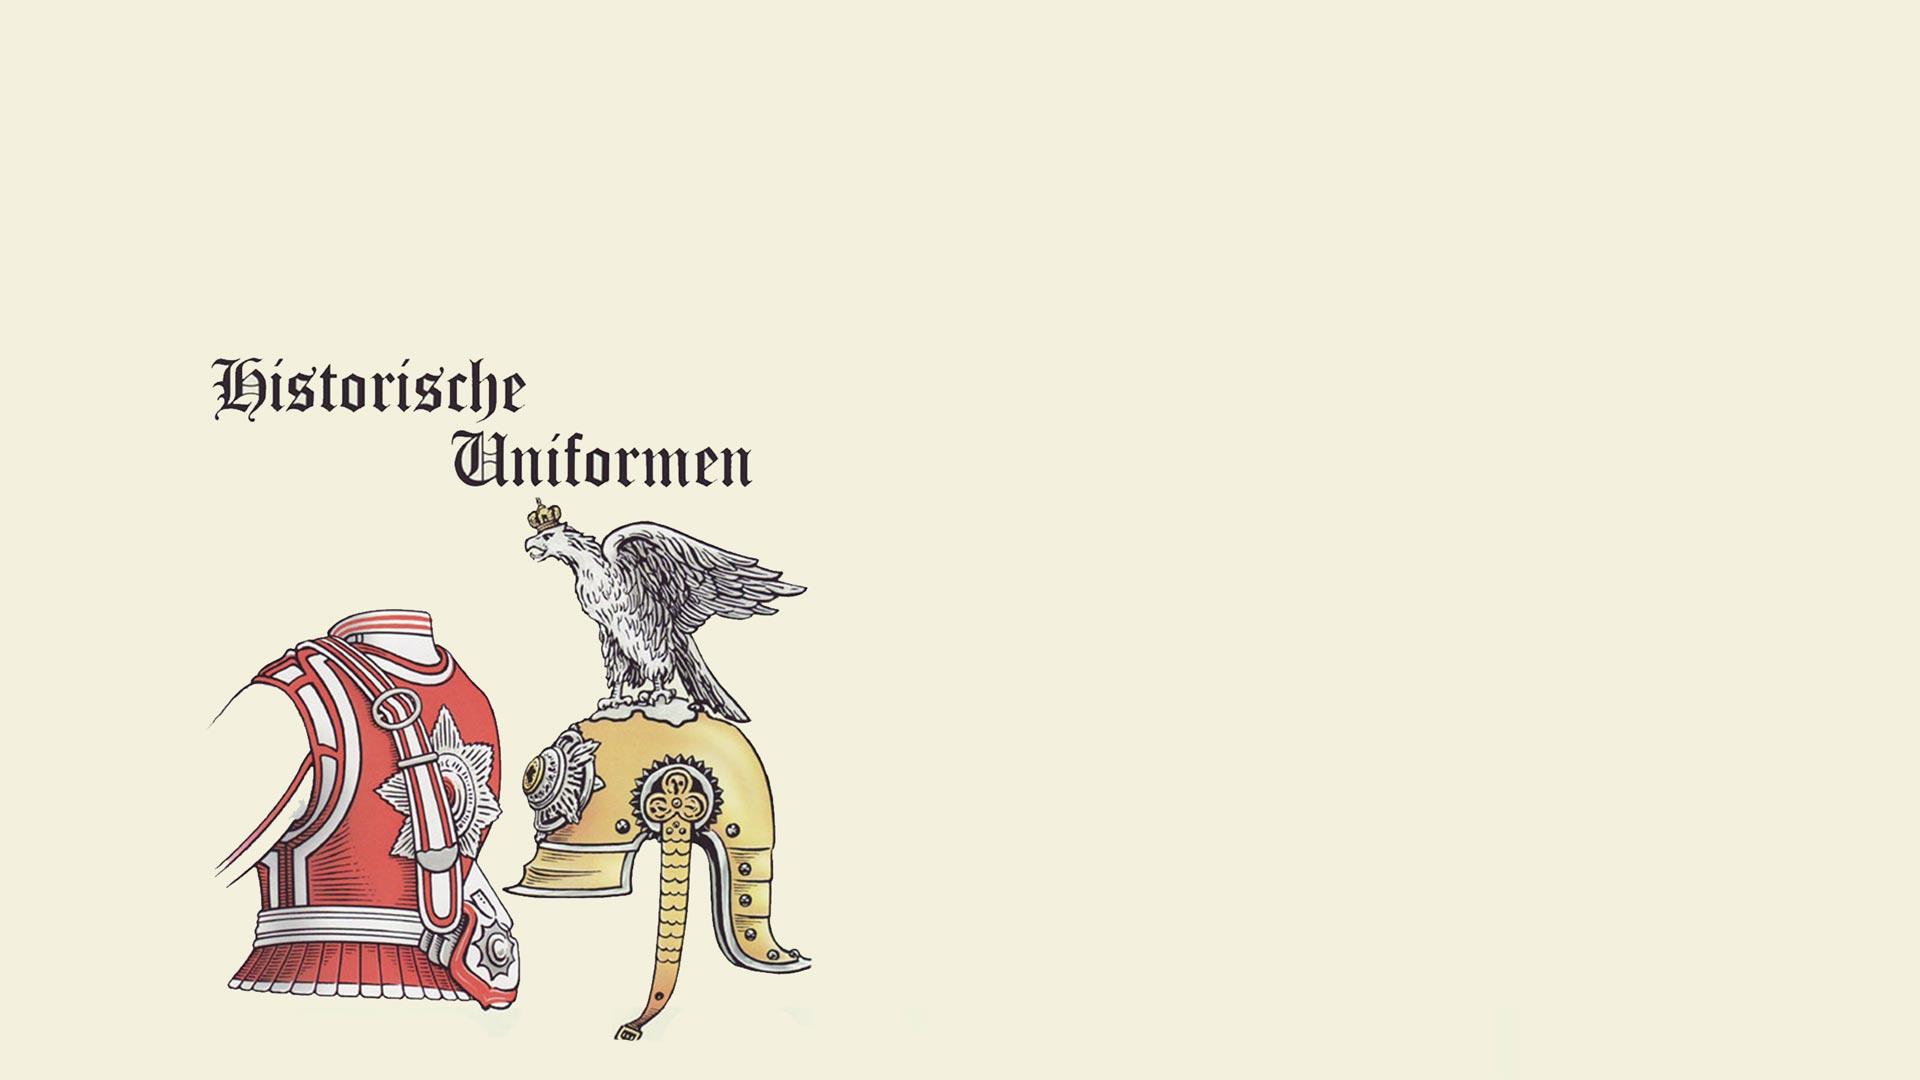 Historische Uniformen mieten